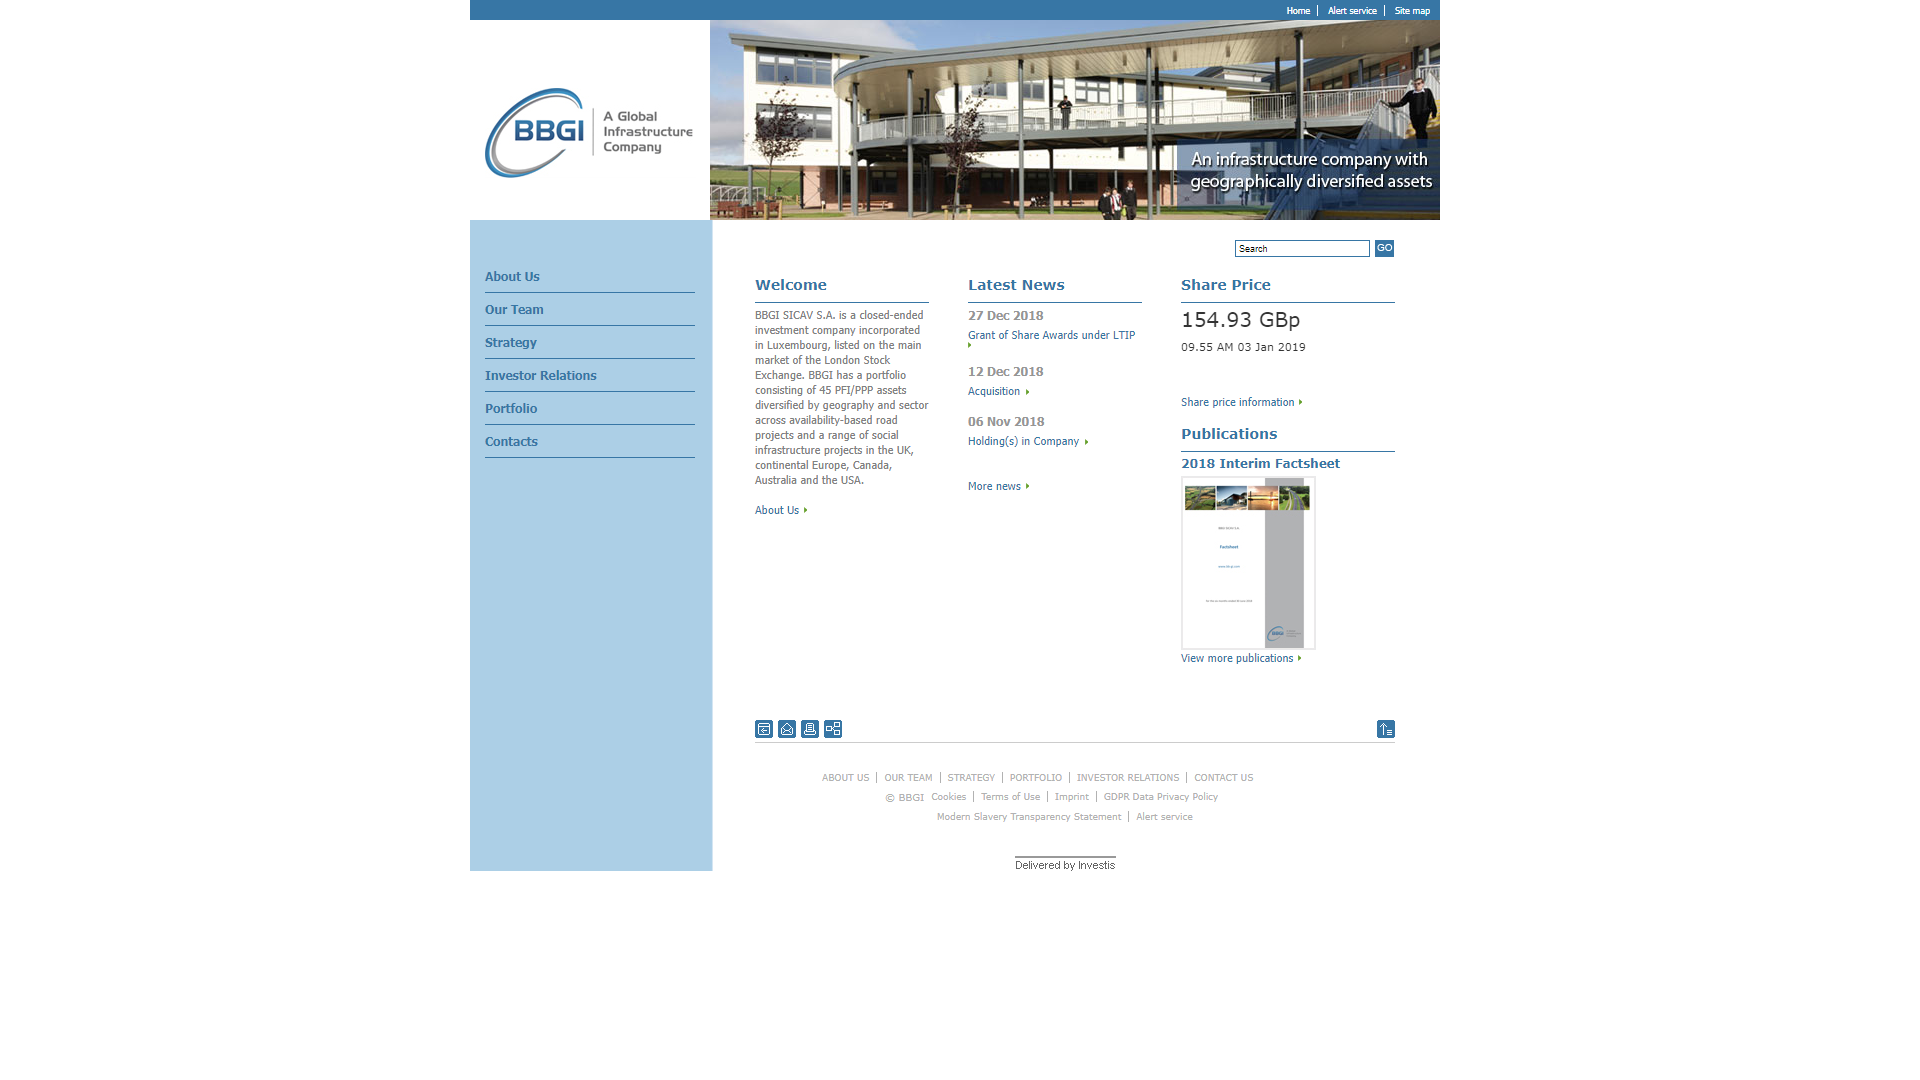 BBGI Home Page